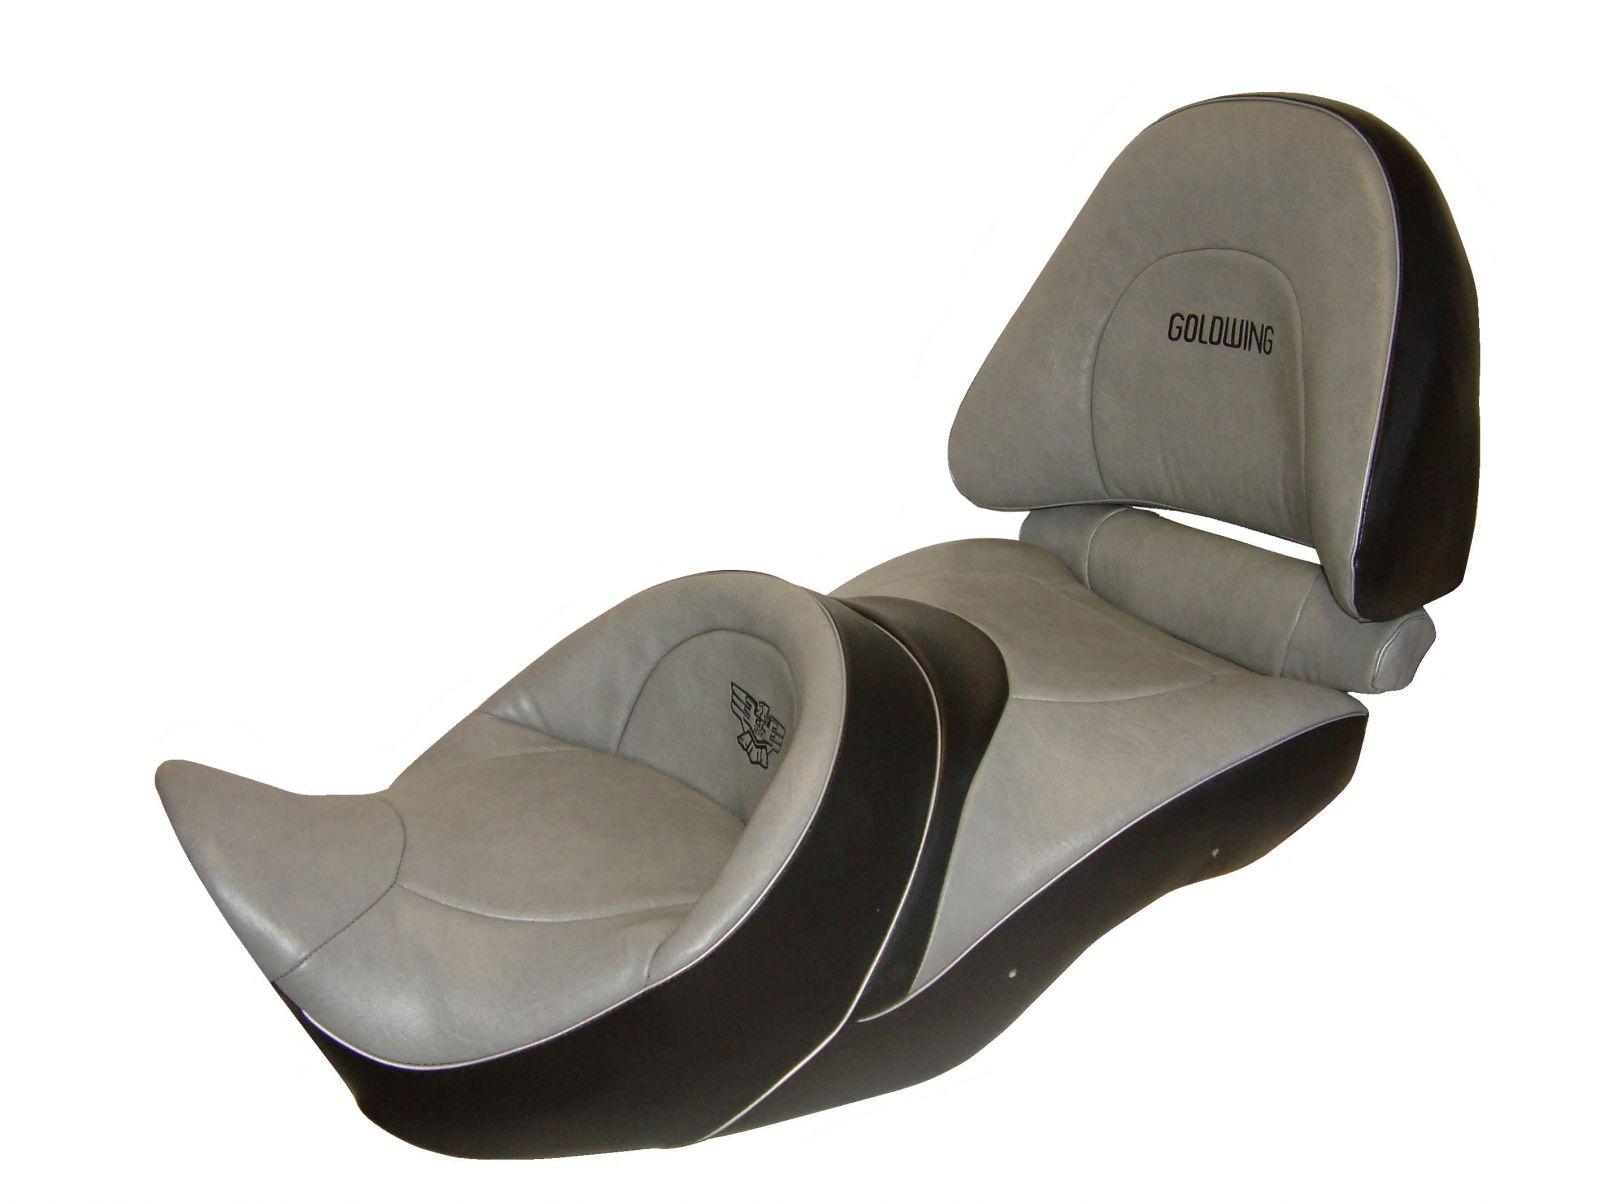 Deluxe seat SGC2740 - HONDA GL 1800 GOLDWING [2001-2005]